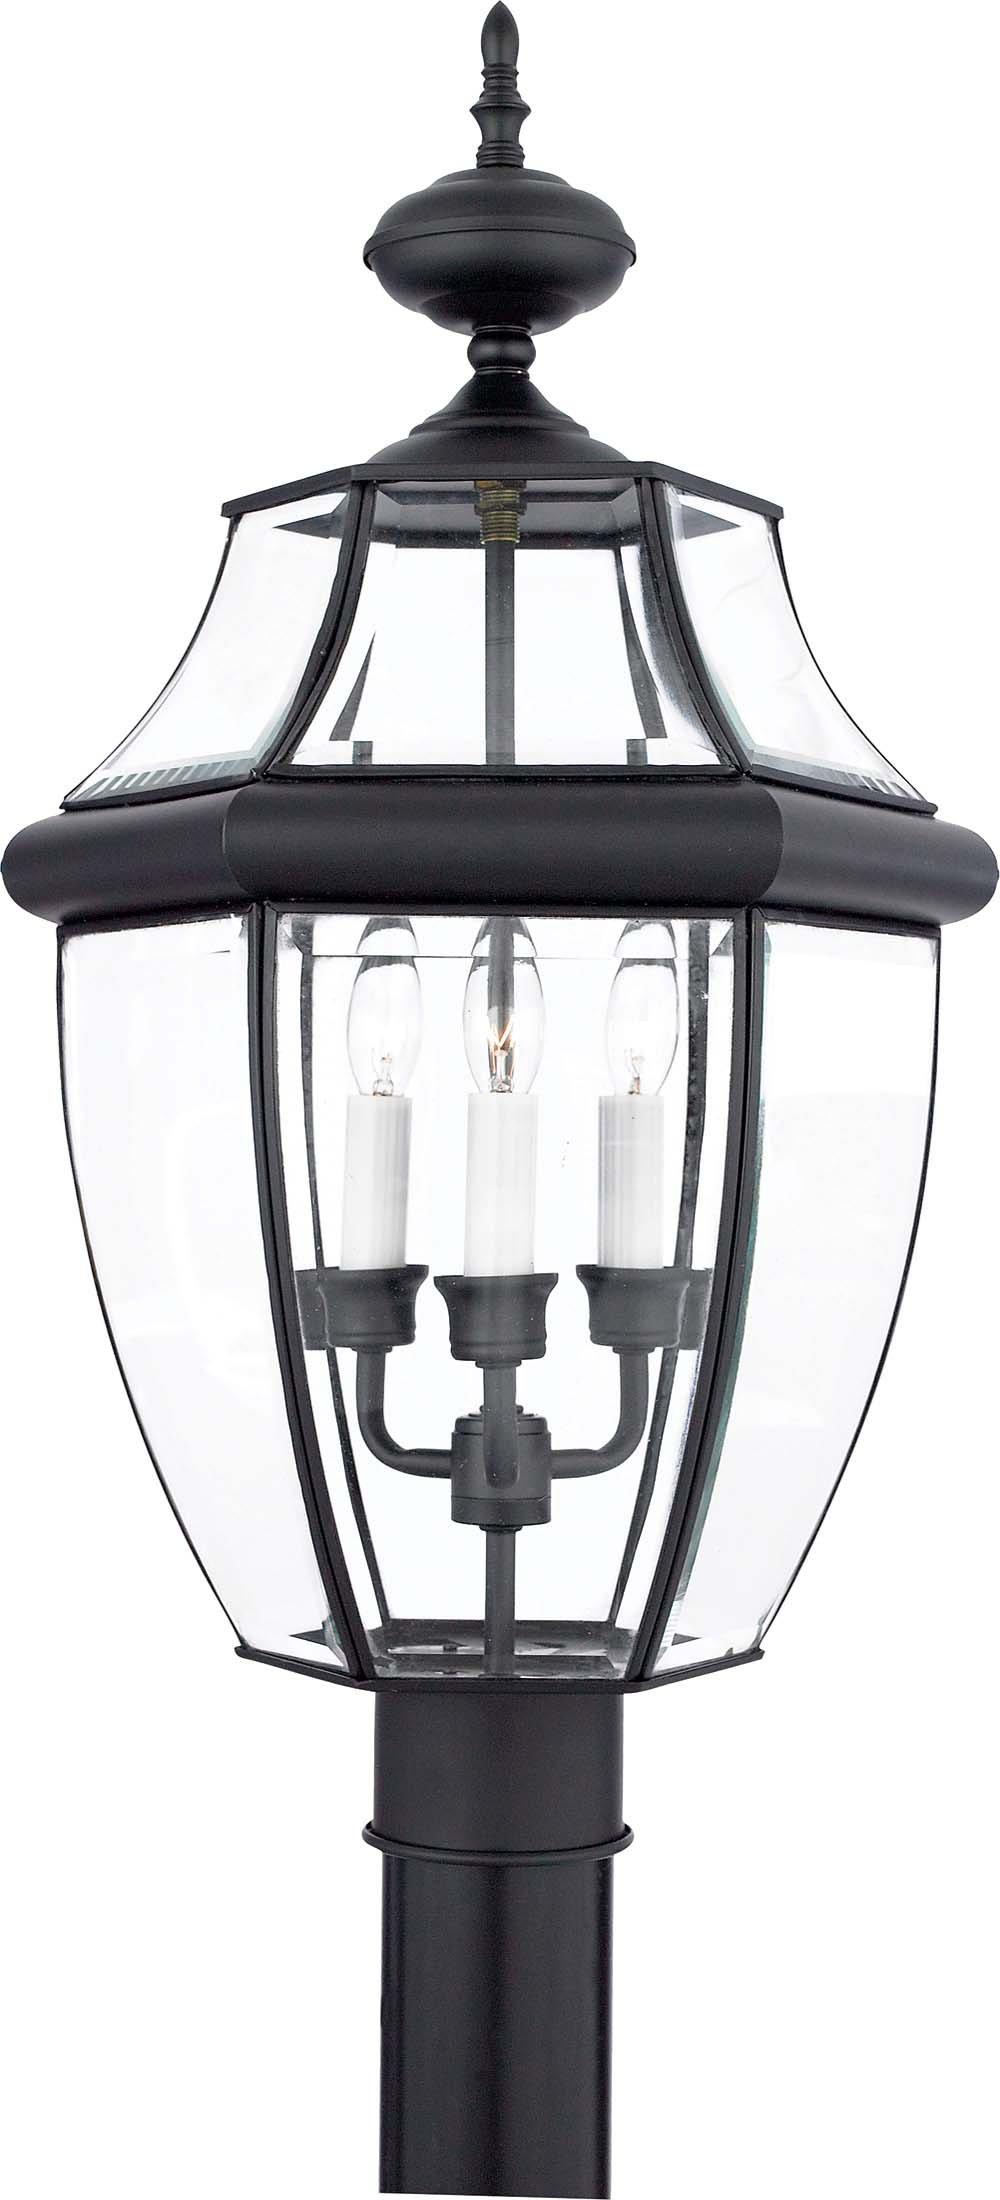 Quoizel NY9043K 3-Light Newbury Outdoor Lantern in Mystic Black by Quoizel